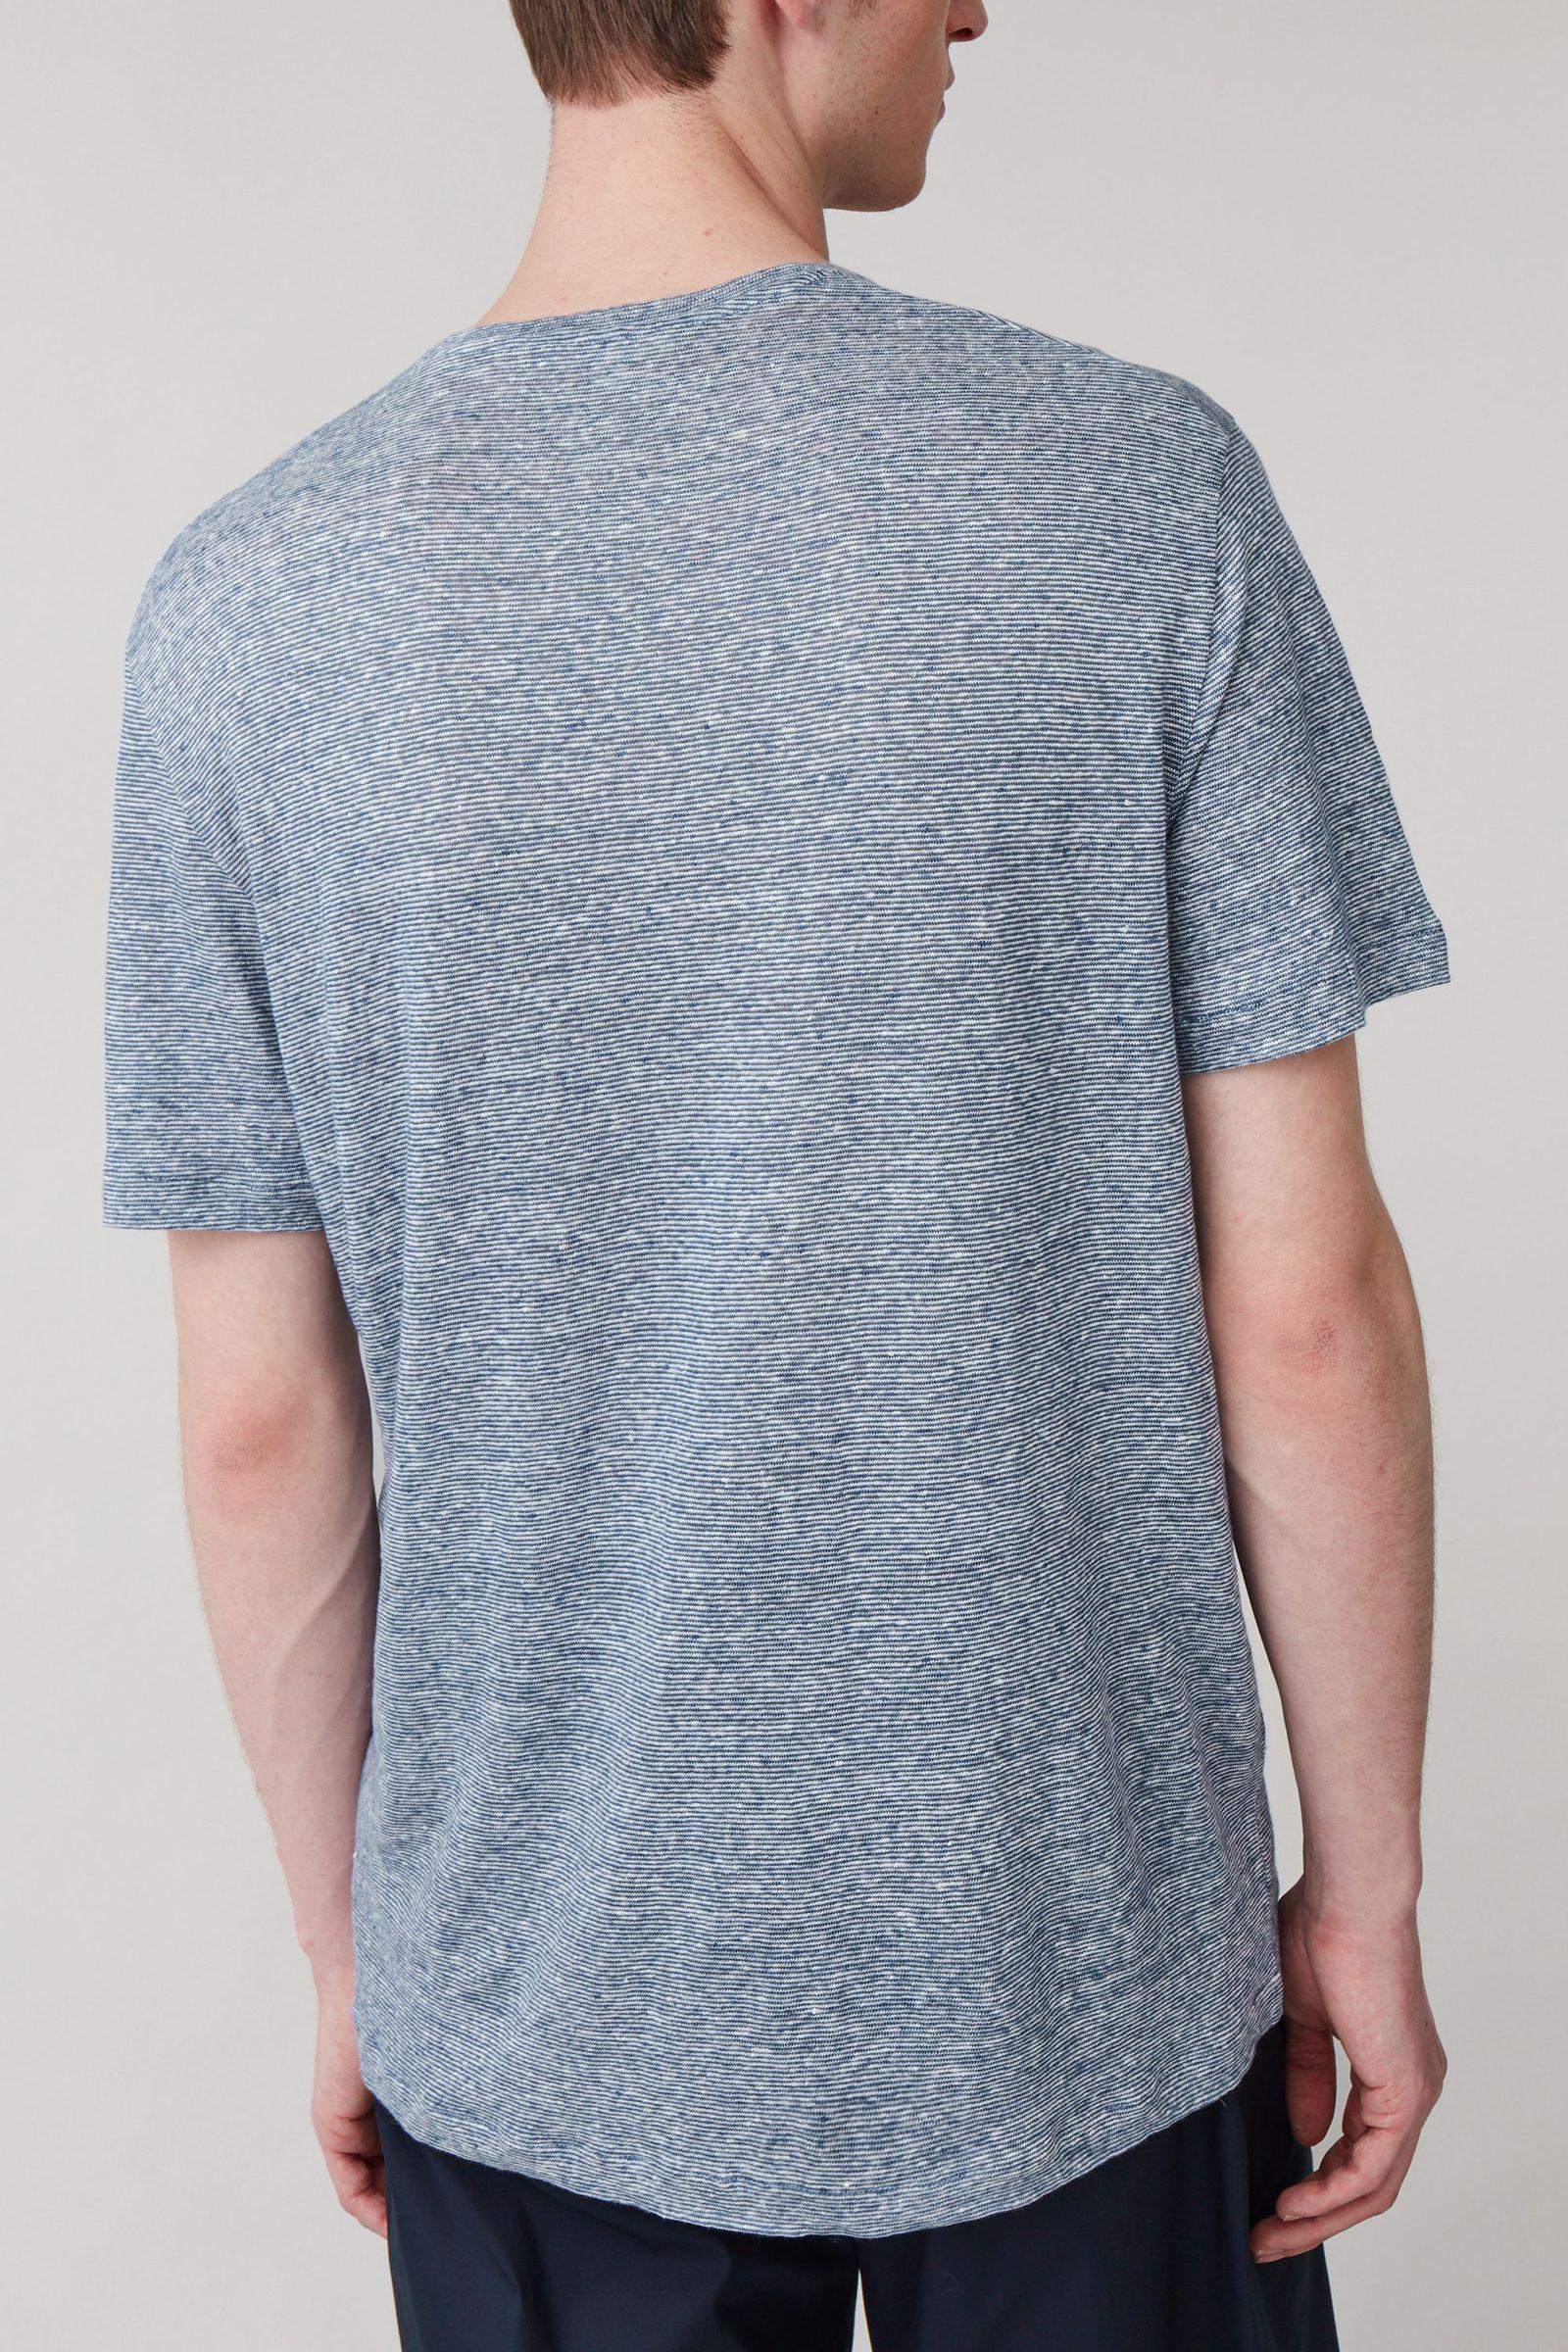 COS 쇼트 슬리브 리넨 티셔츠의 블루컬러 ECOMLook입니다.